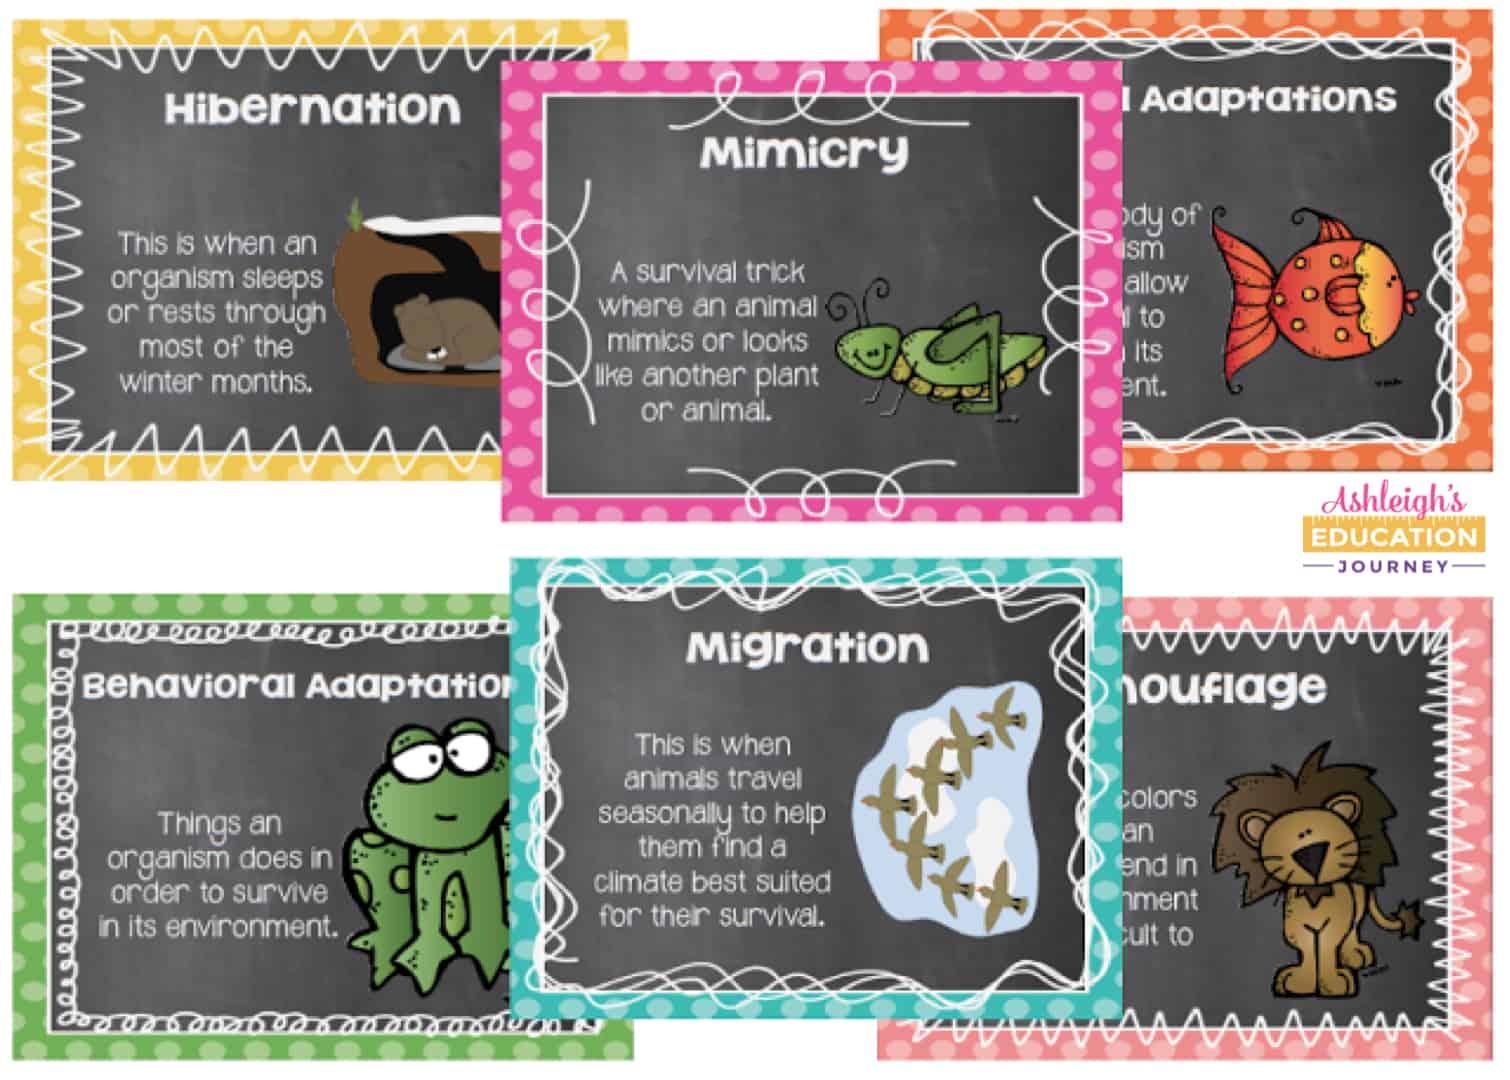 hight resolution of Animal Adaptations Lessons \u0026 Activities - Ashleigh's Education Journey